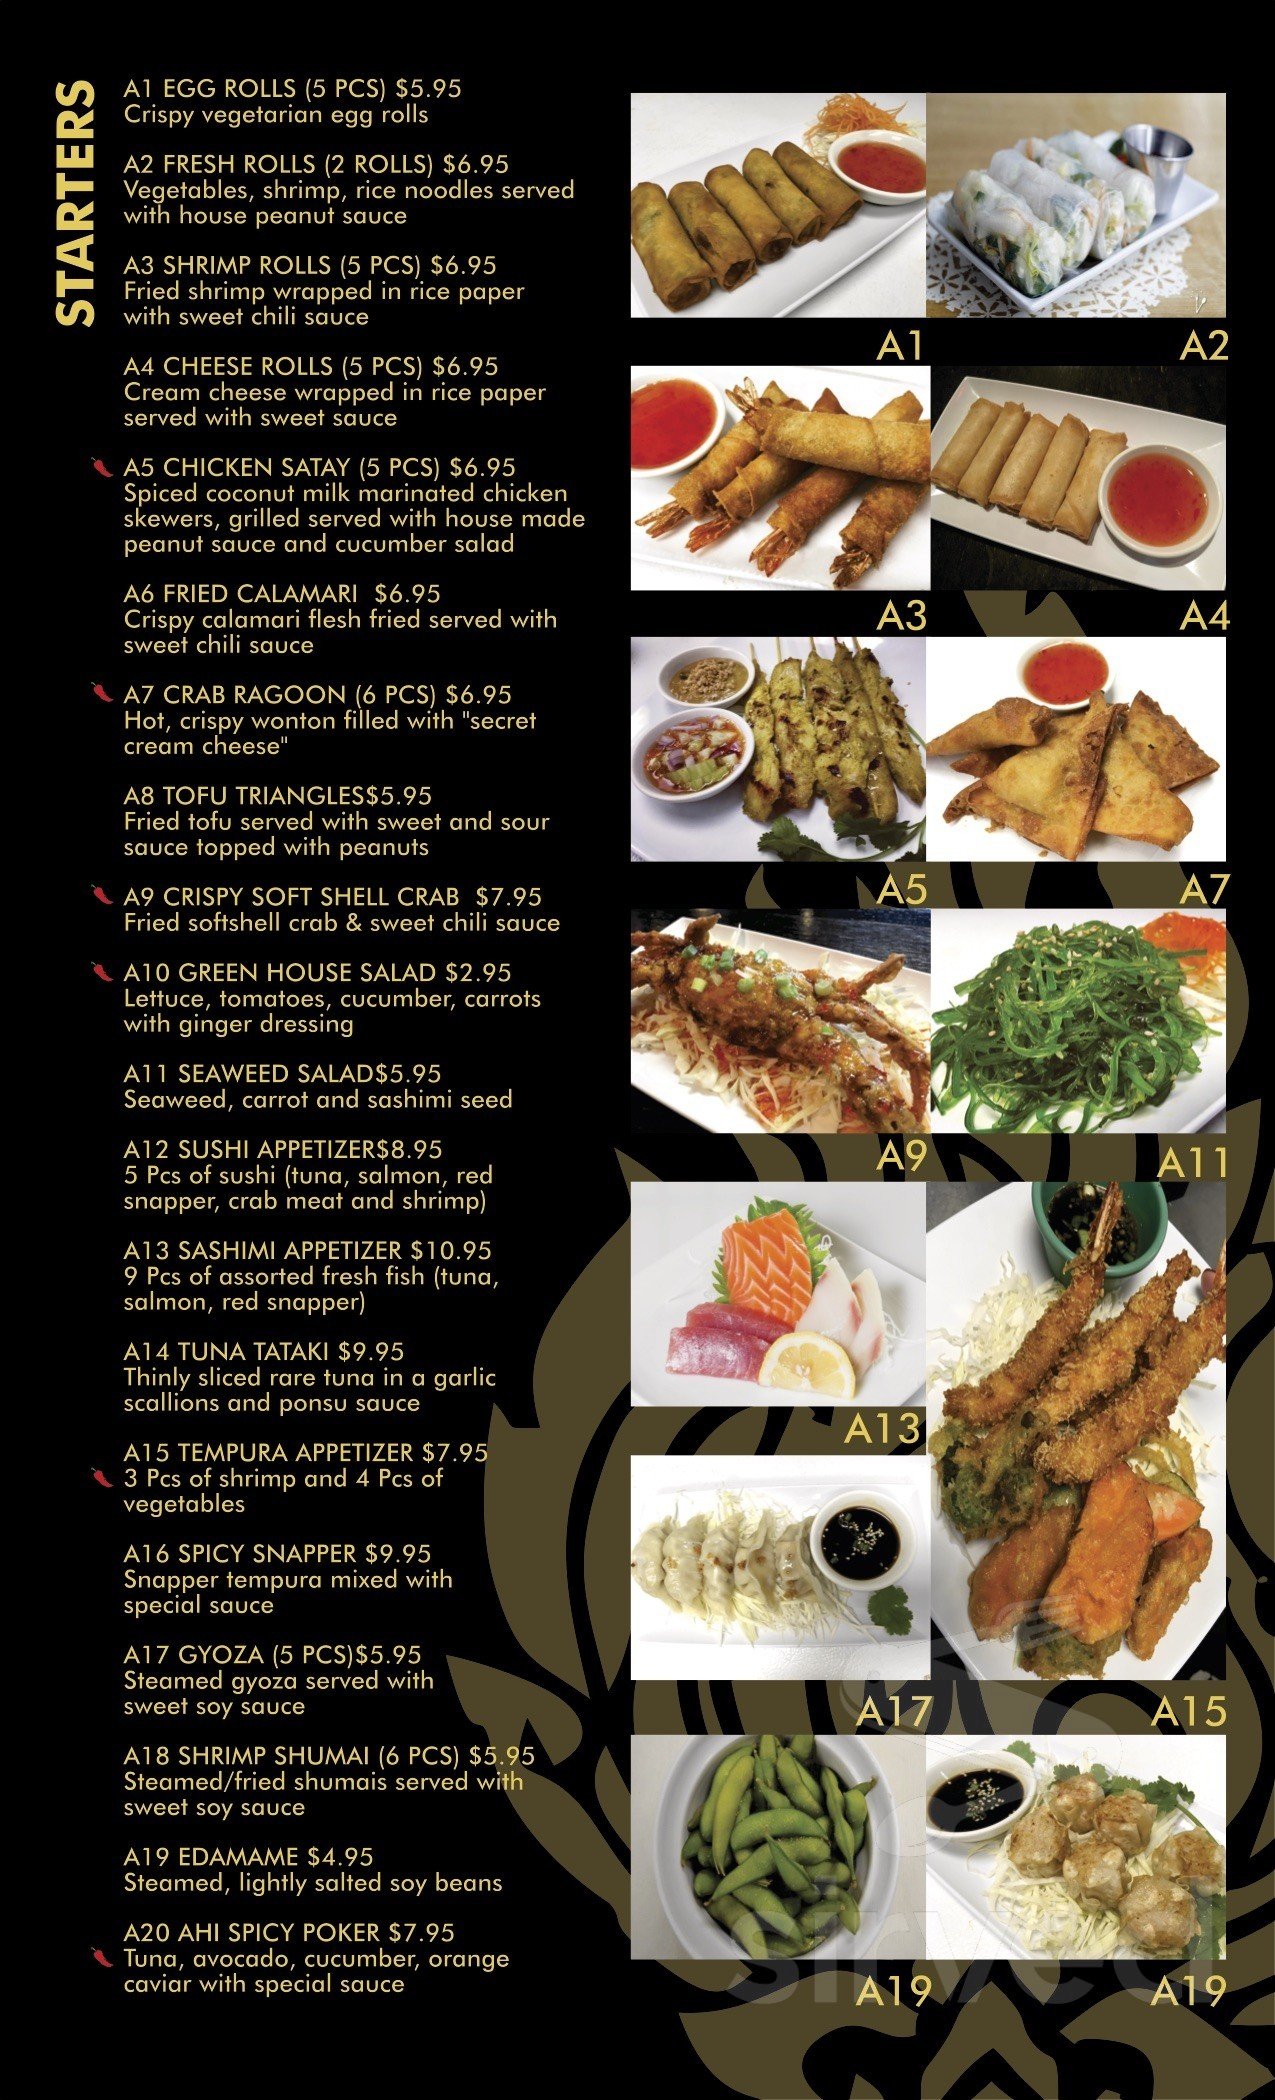 Taste Of Thai Sushi Menu In Kingwood Texas Usa